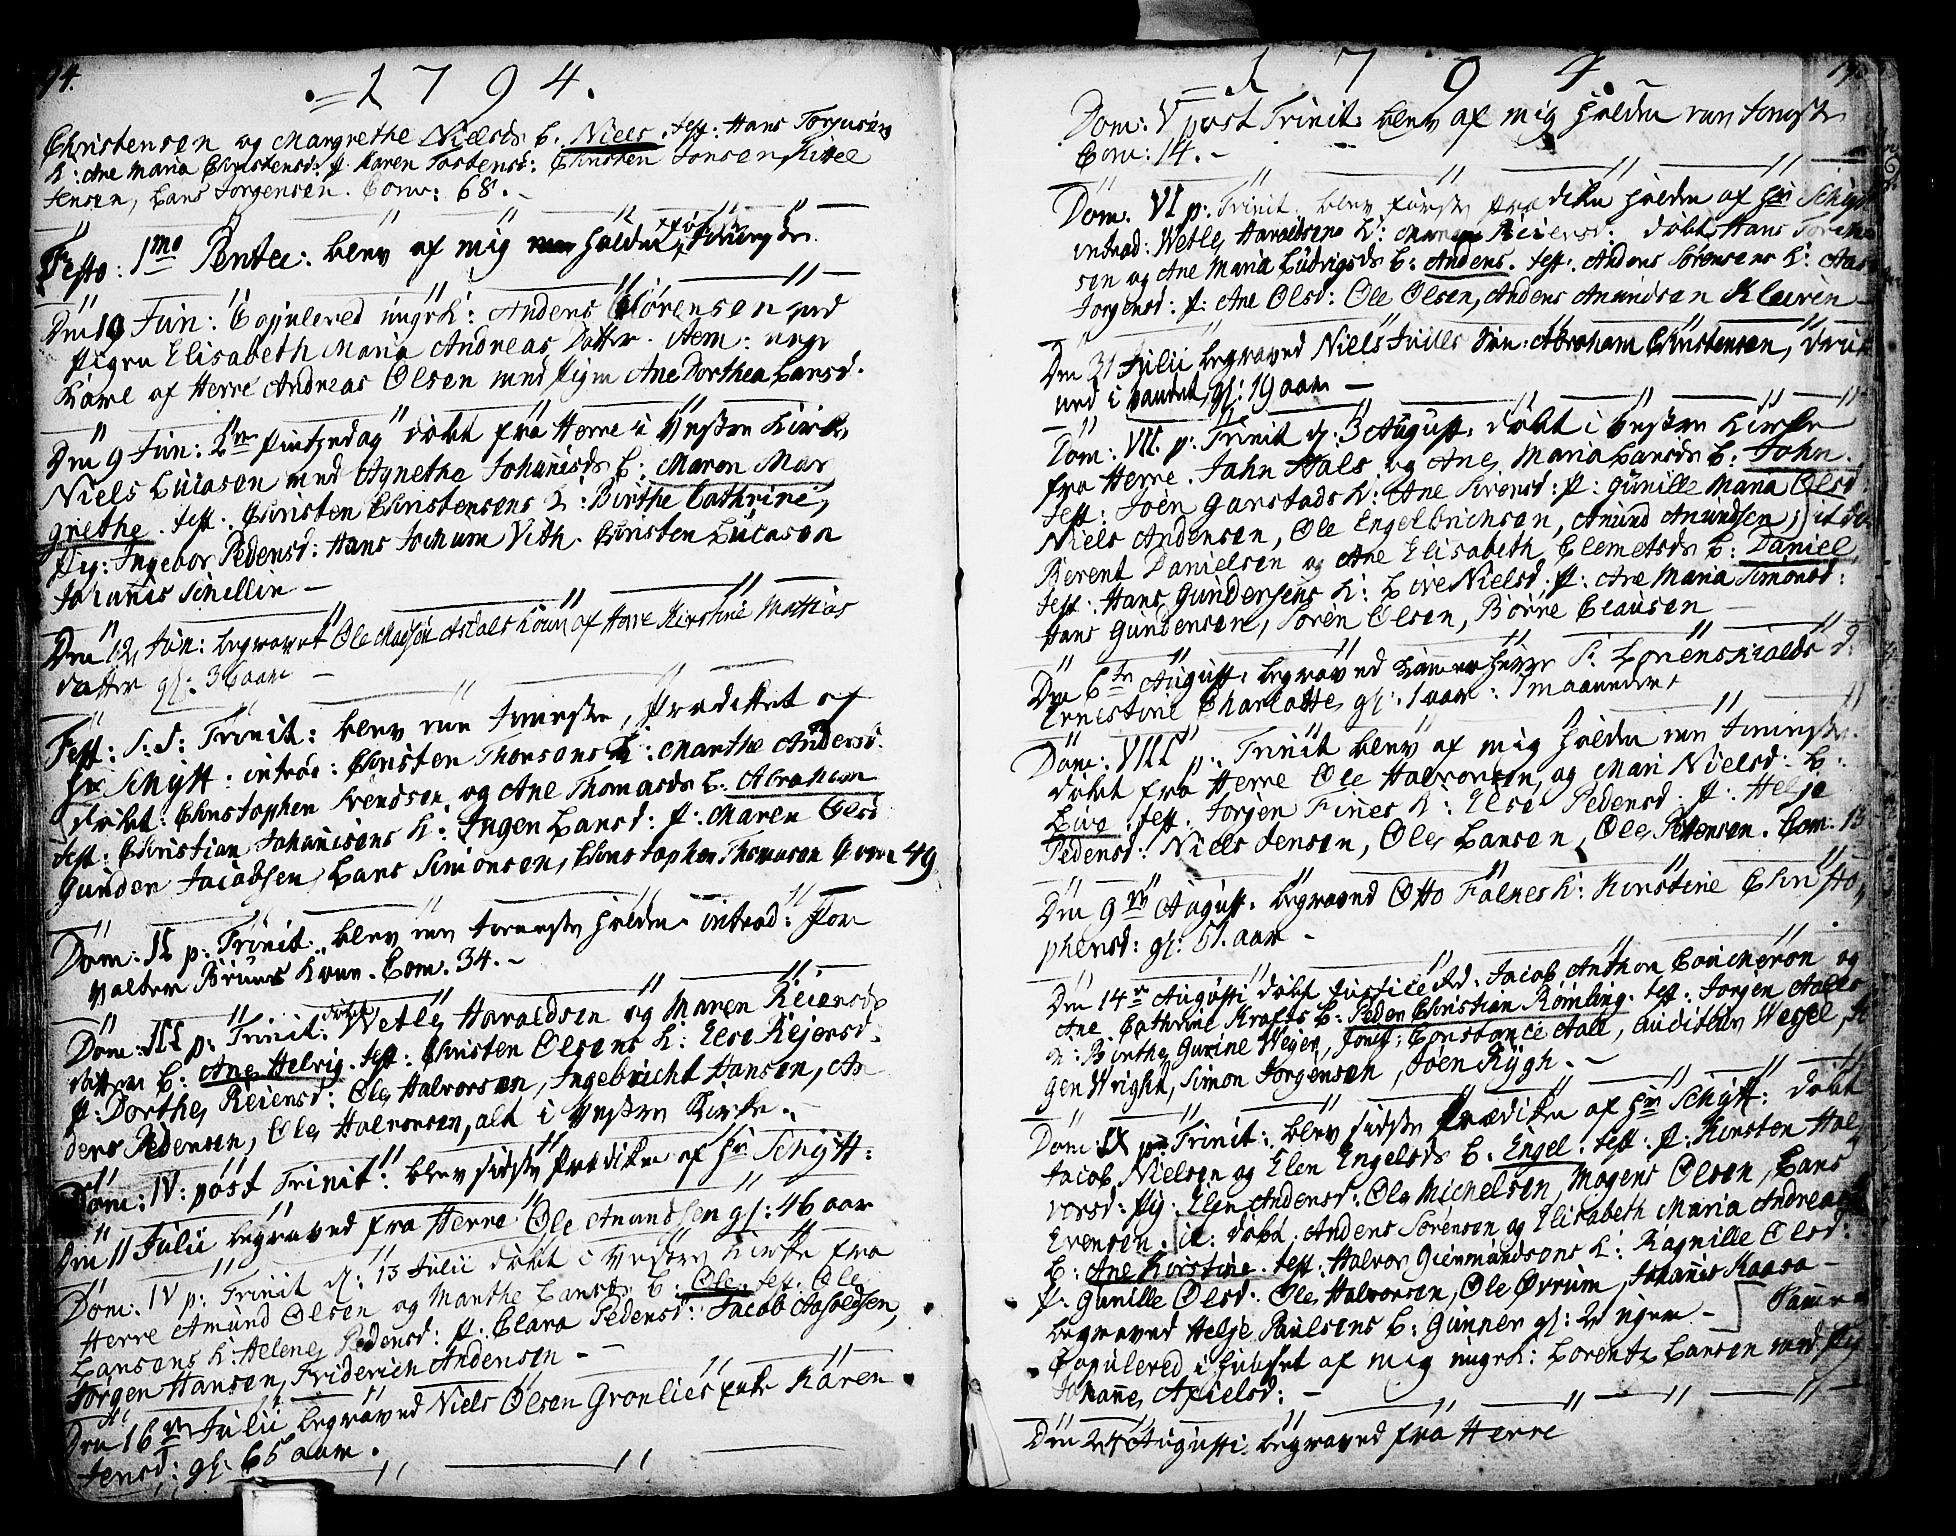 SAKO, Porsgrunn kirkebøker , F/Fa/L0002: Parish register (official) no. 2, 1764-1814, p. 194-195